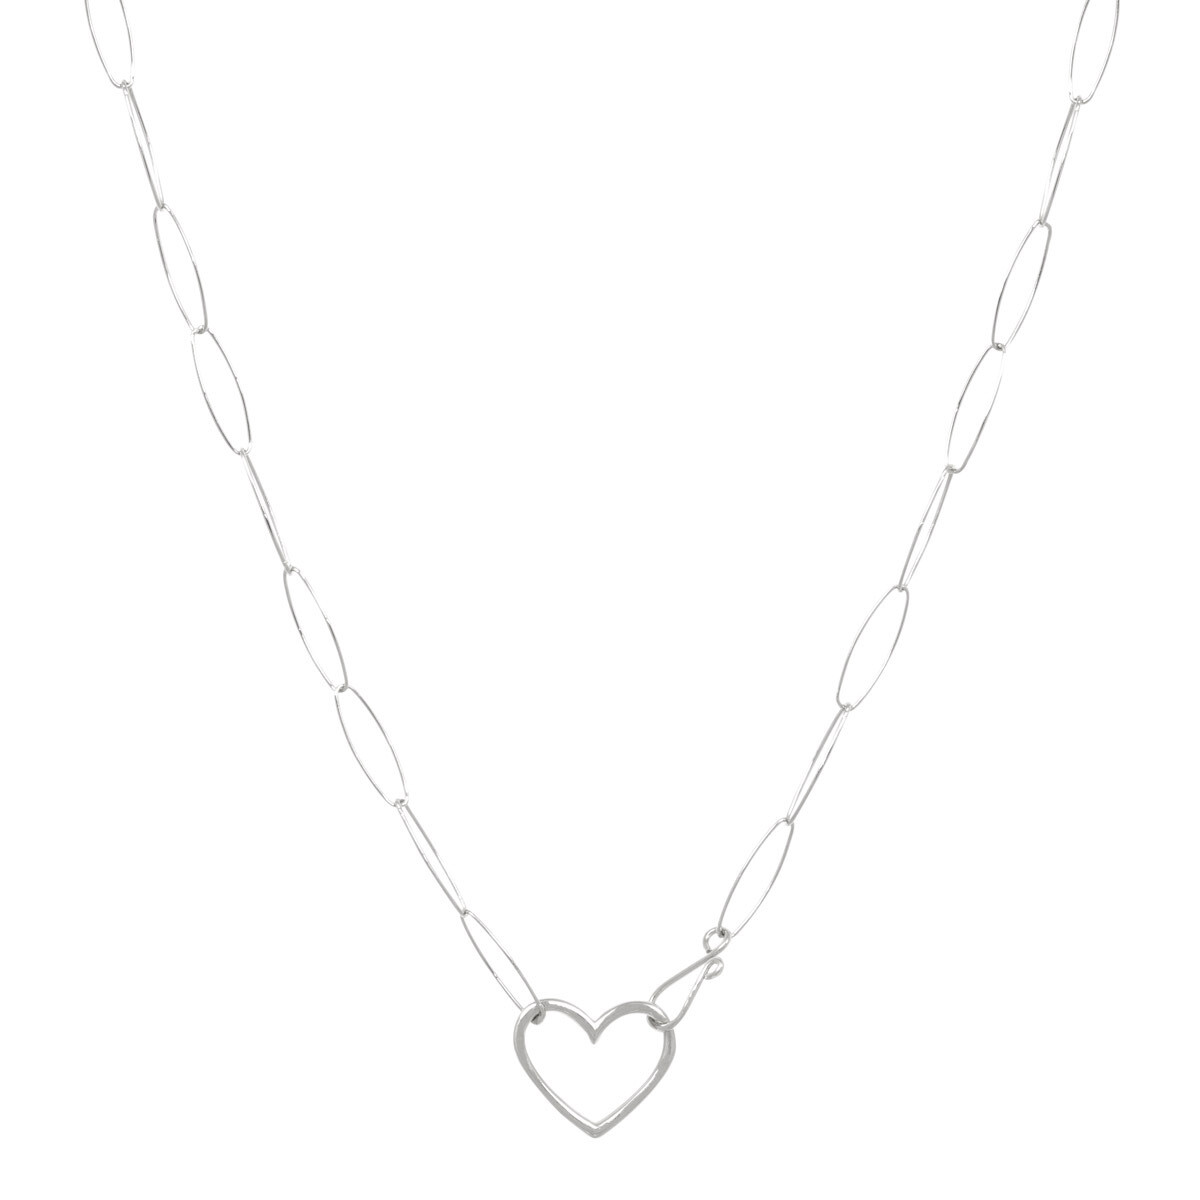 Kette open heart silber